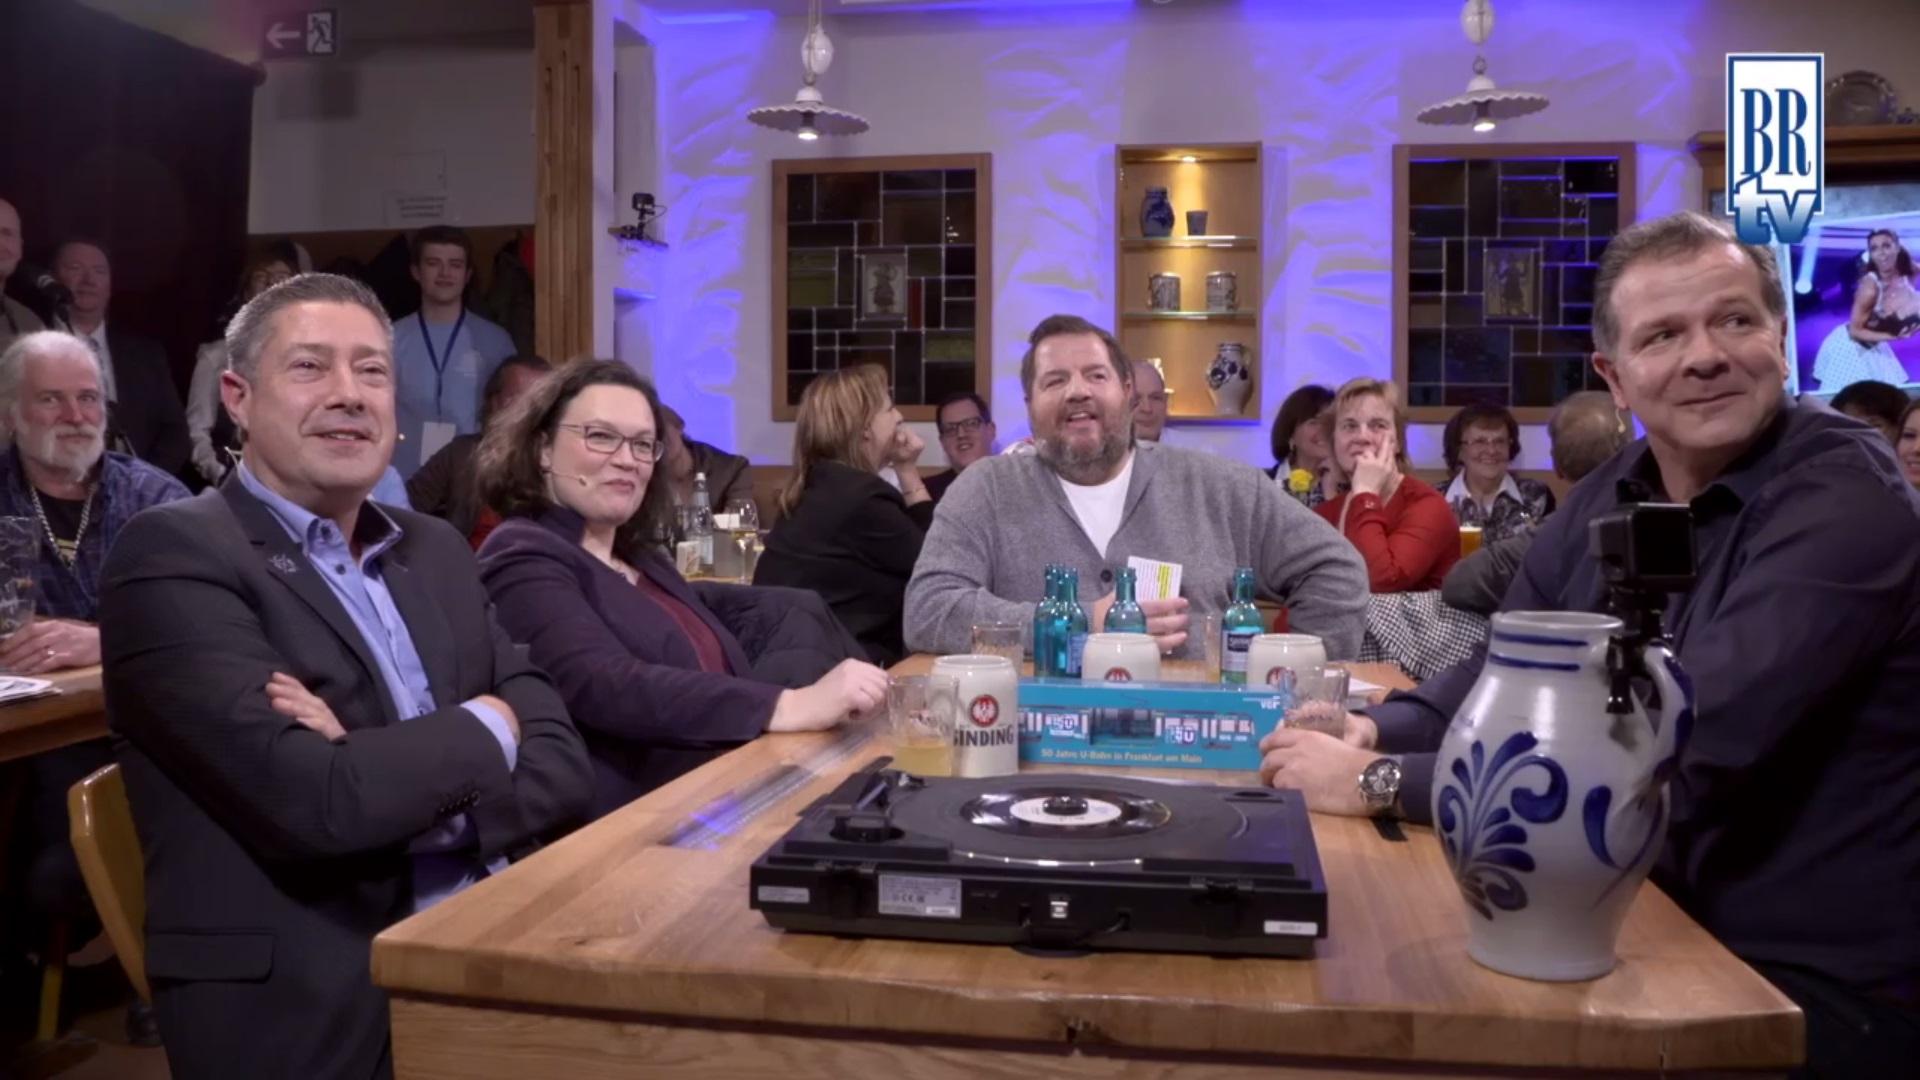 Bembel & Gebabbel – Folge 41 mit Andrea Nahles, Joachim Llambi & Andy Möller